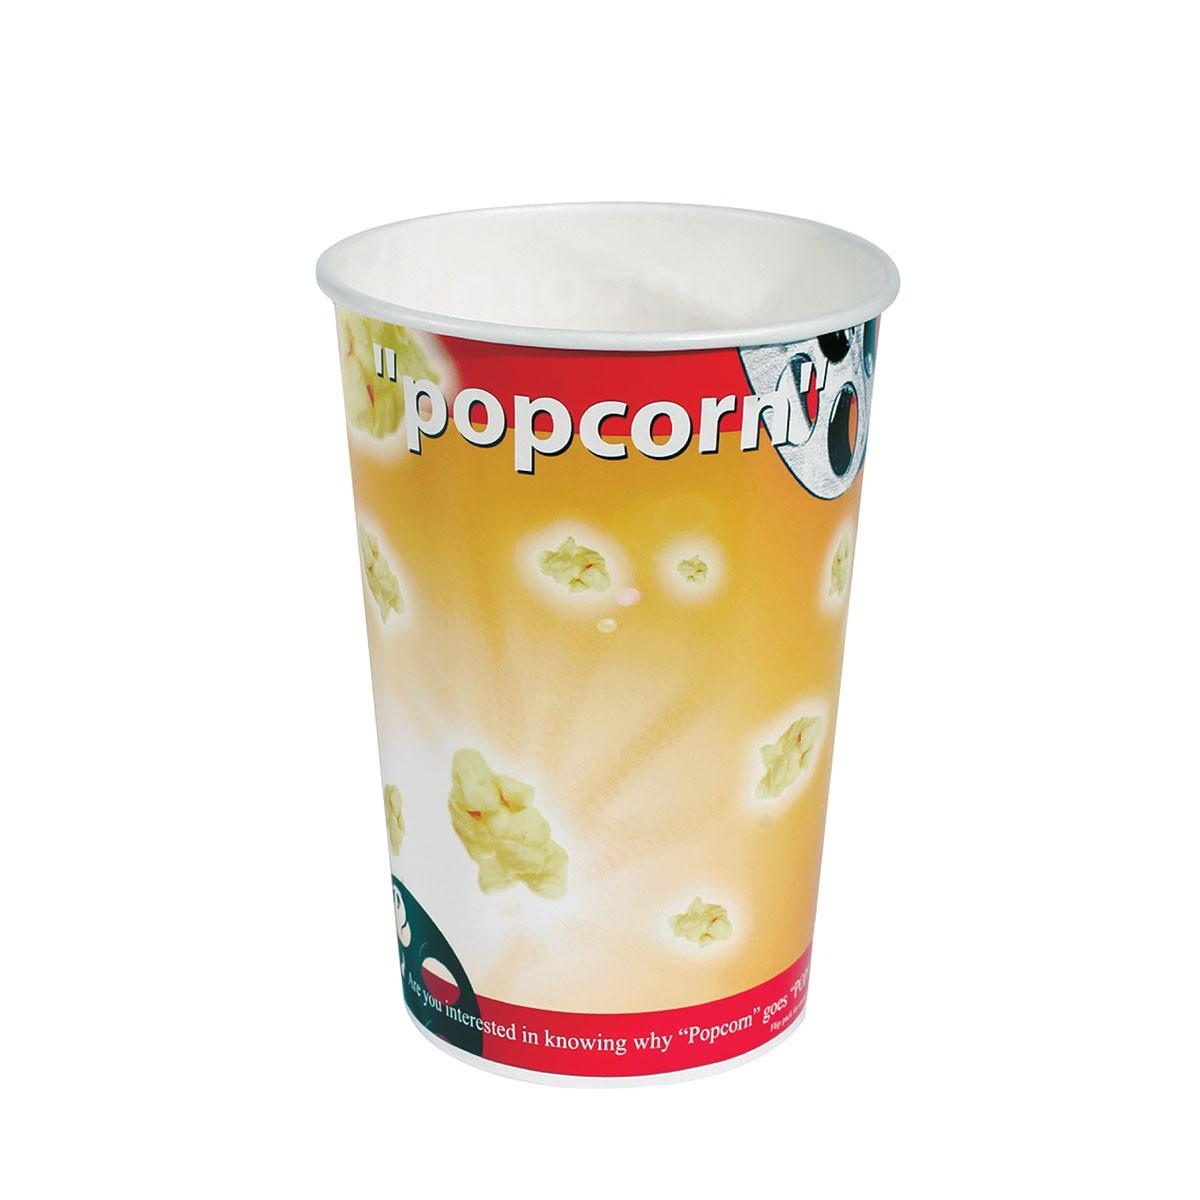 Cardboard Popcorn Pack 46oz - Cinema | 50pcsx10pkts